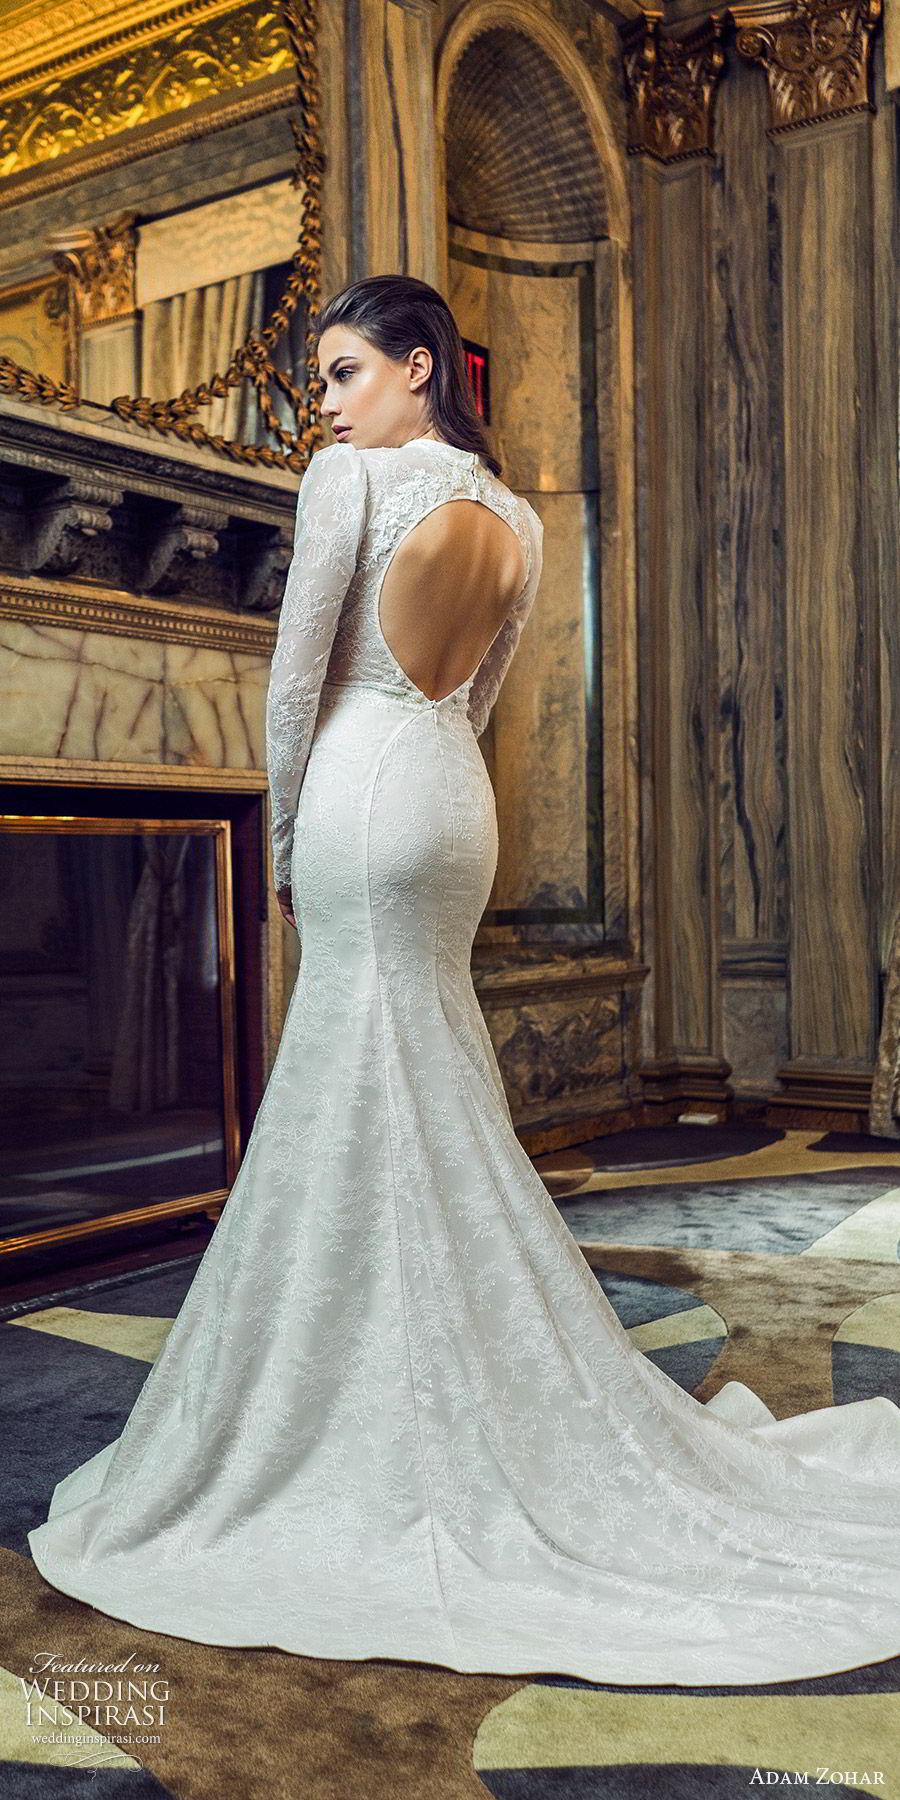 adam zohar 2020 bridal long puff sleeves high neck cutout deep v neckline fully lace mermaid fit flare wedding dress (14) vintage romantic chapel train cutout back bv